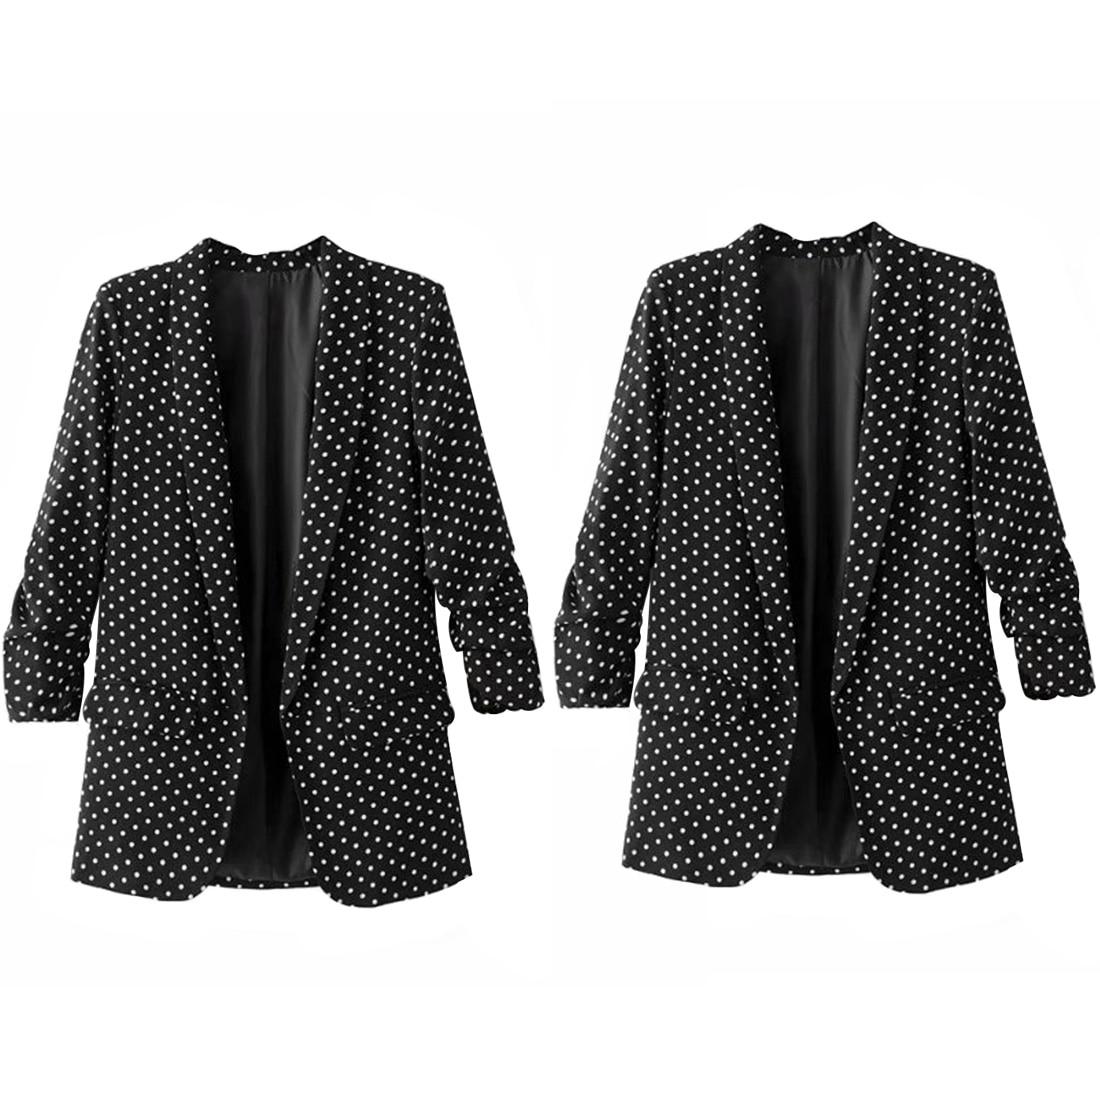 Comfortable Women Polka Dot Blazer Padded Shoulder Notched Collar Long Sleeve Coat Casual Outerwear Casaco Feminine Tops